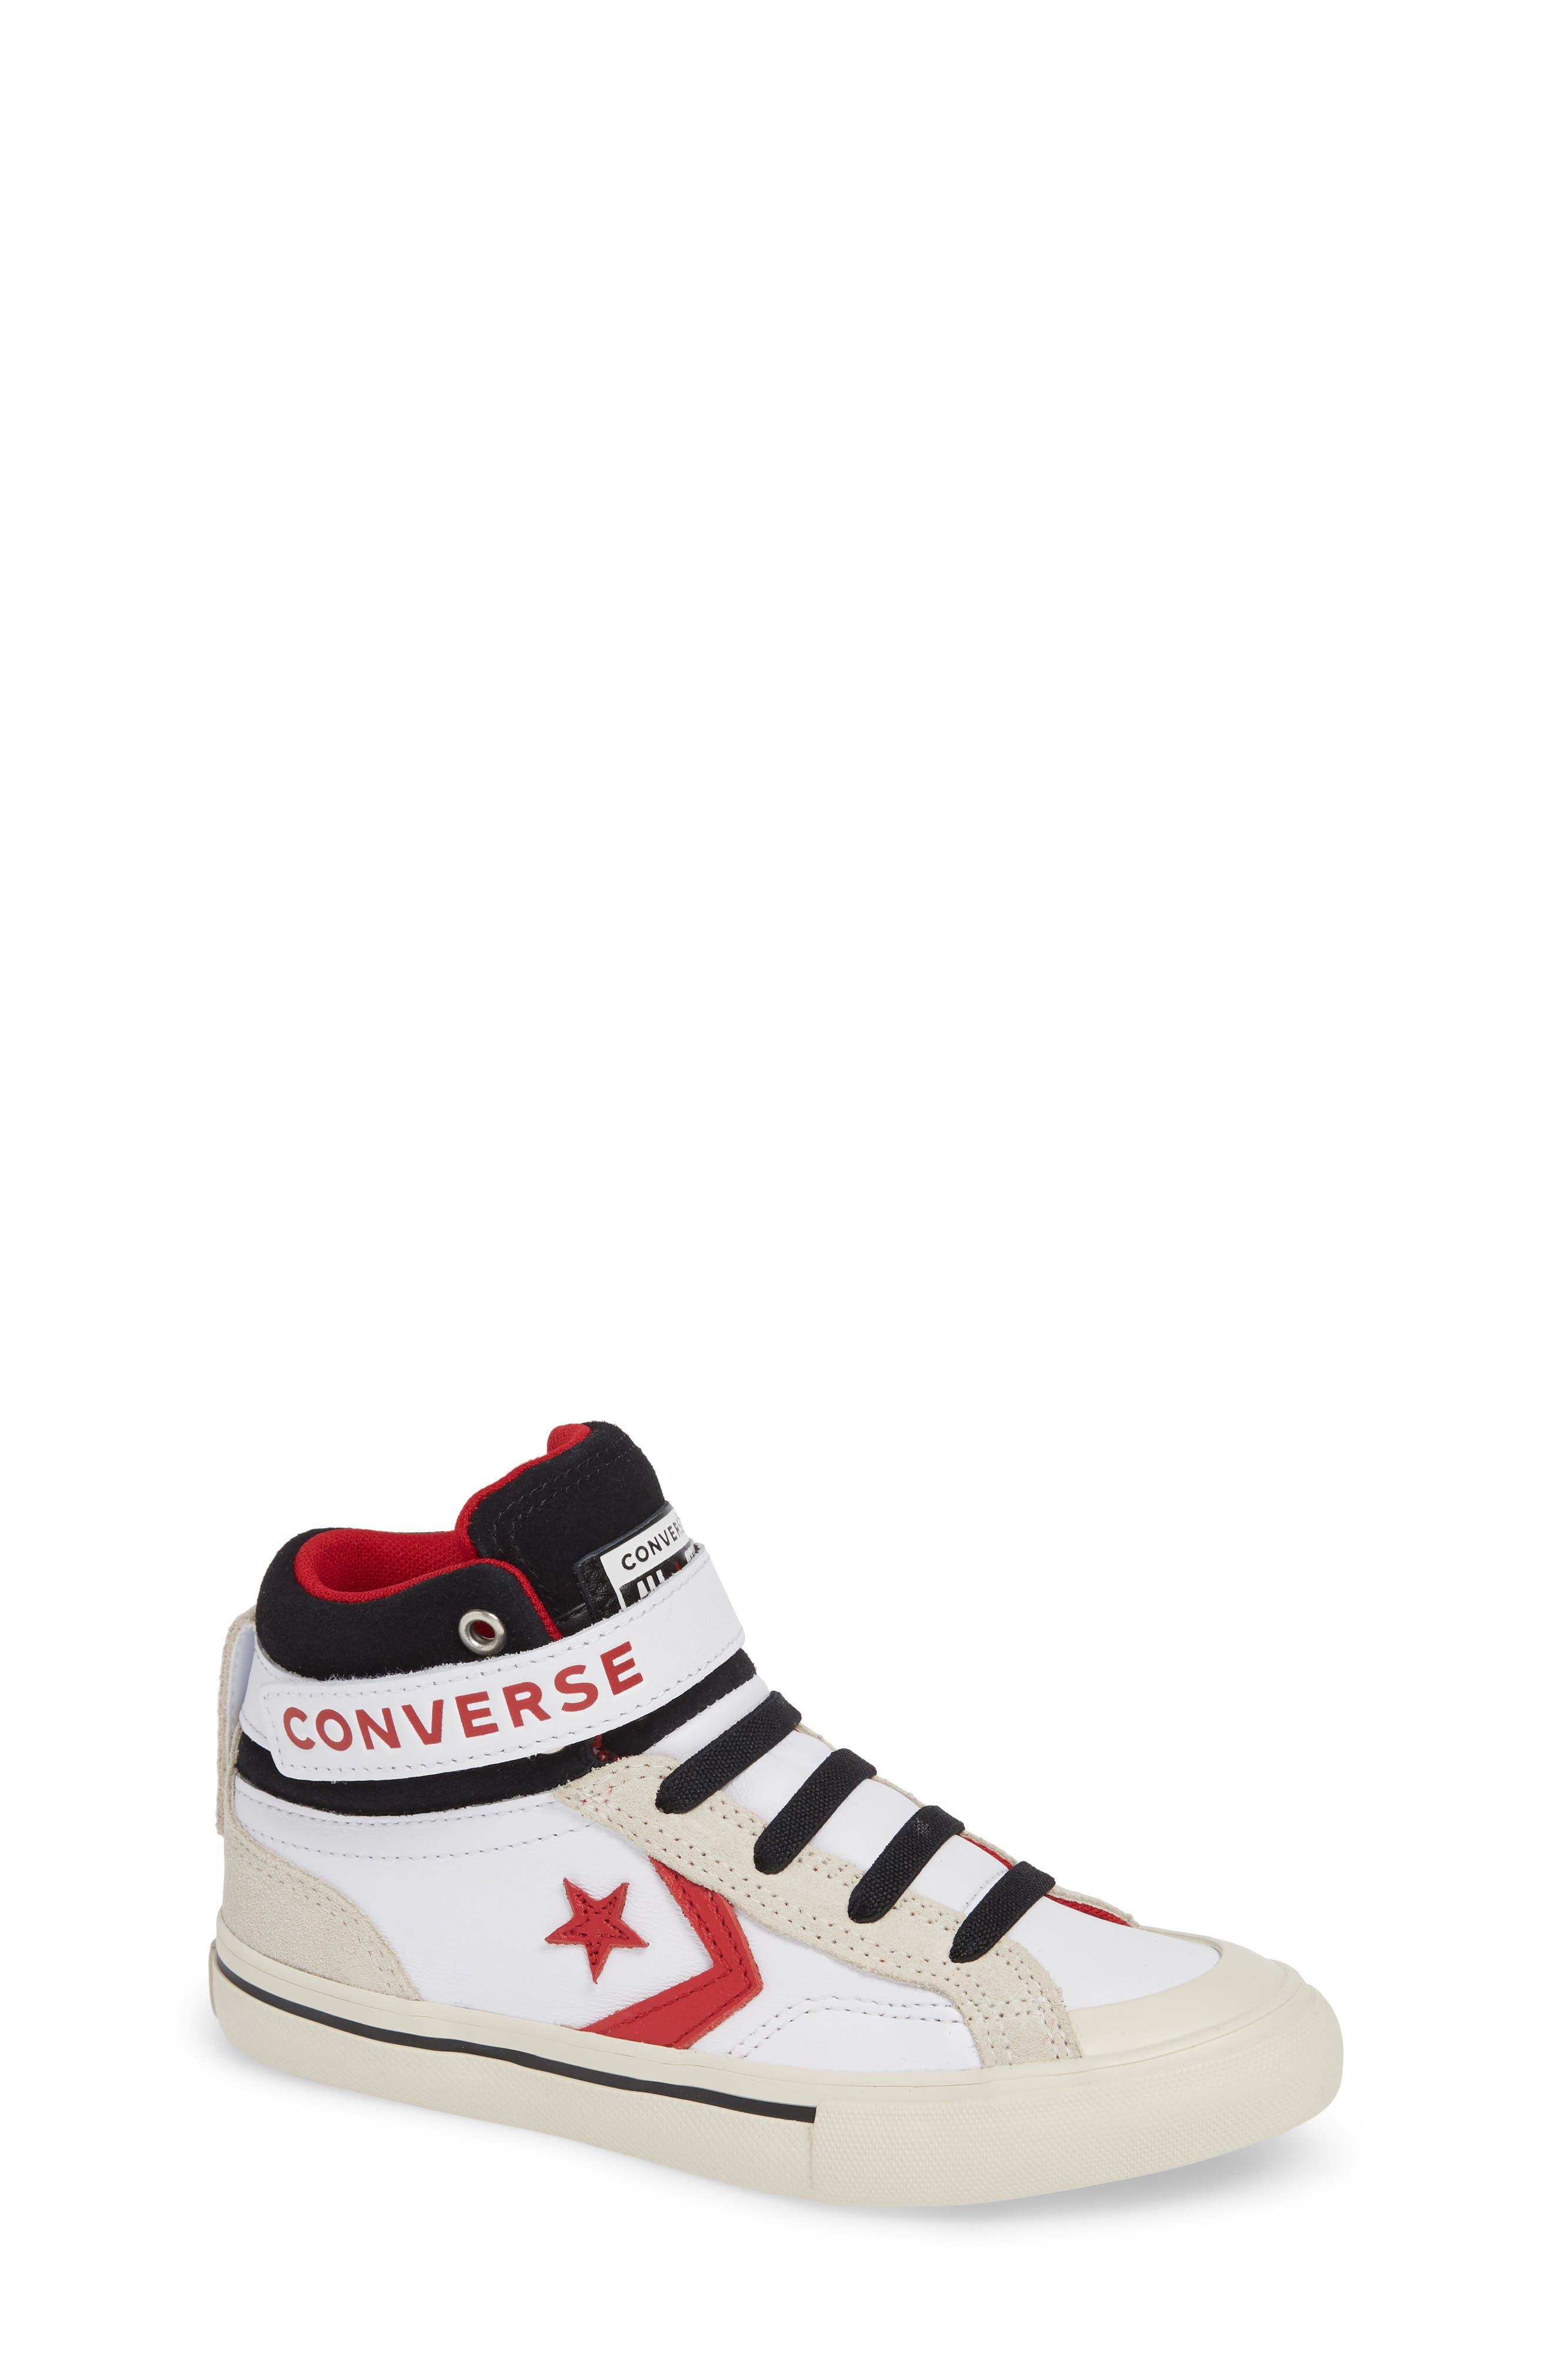 Boys Converse Pro Blaze High Top Sneaker Size 5 M  Blue